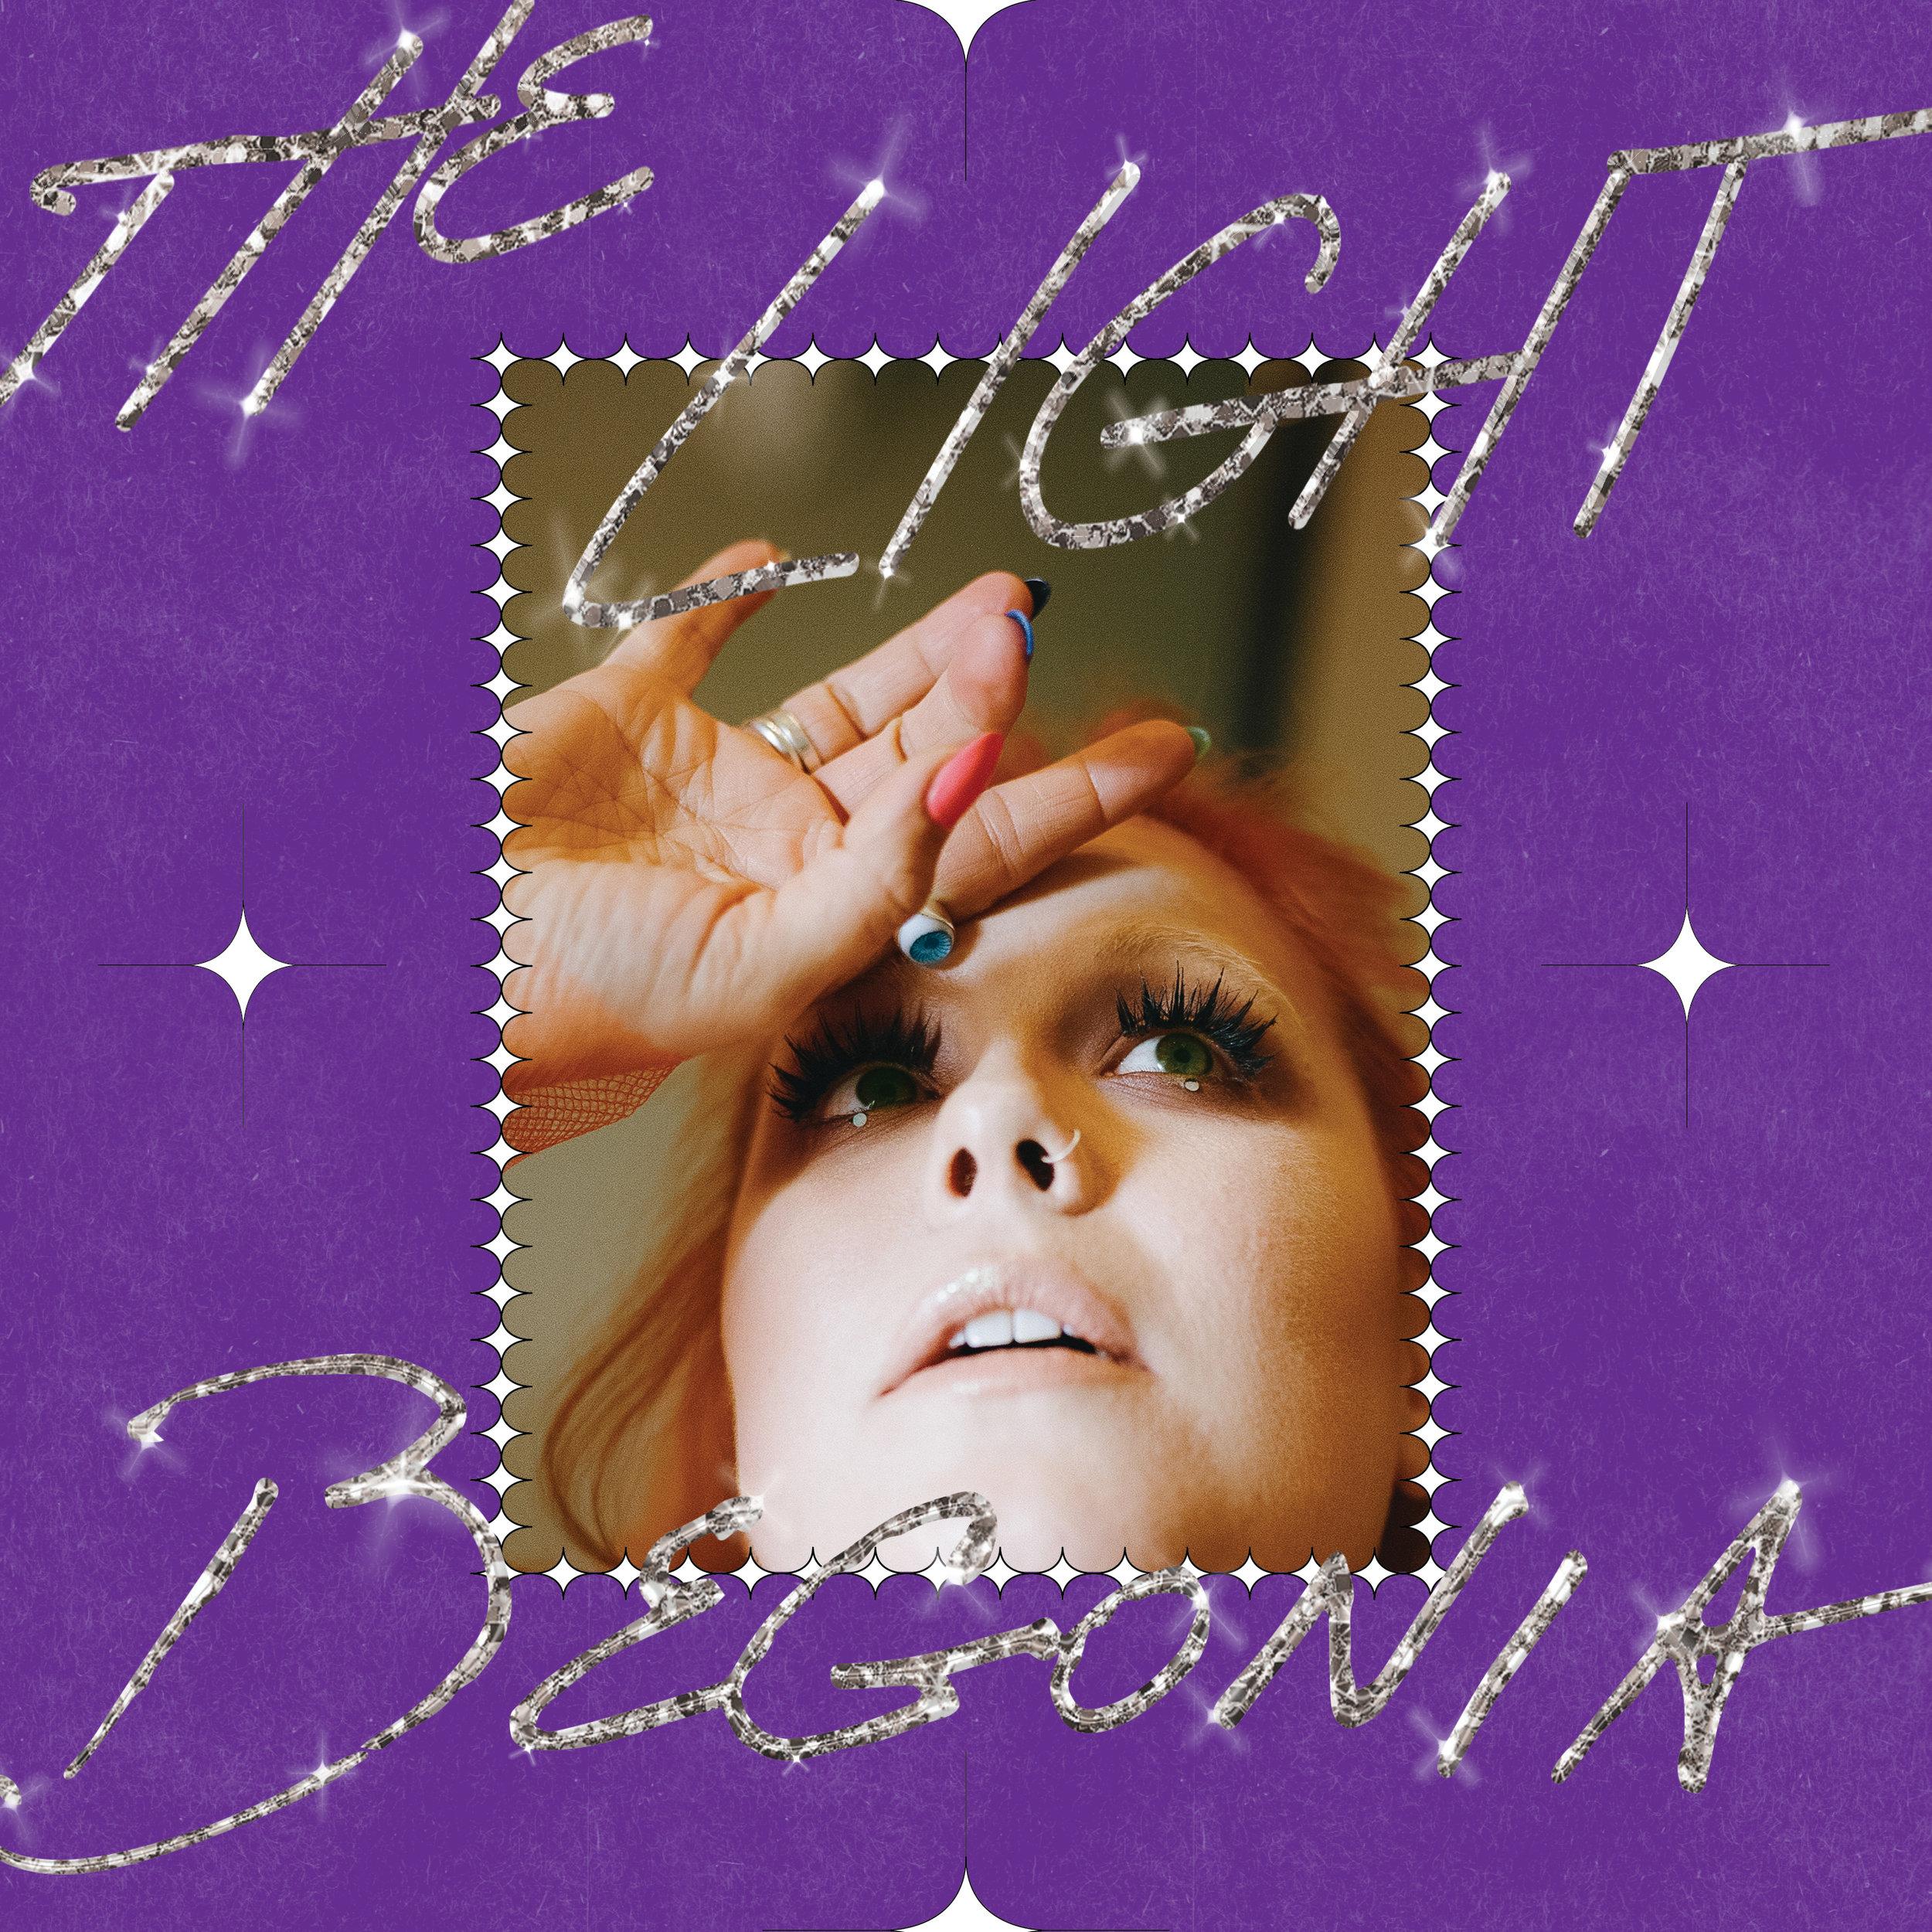 begonia-THE-LIGHT-single-3000x3000.jpg